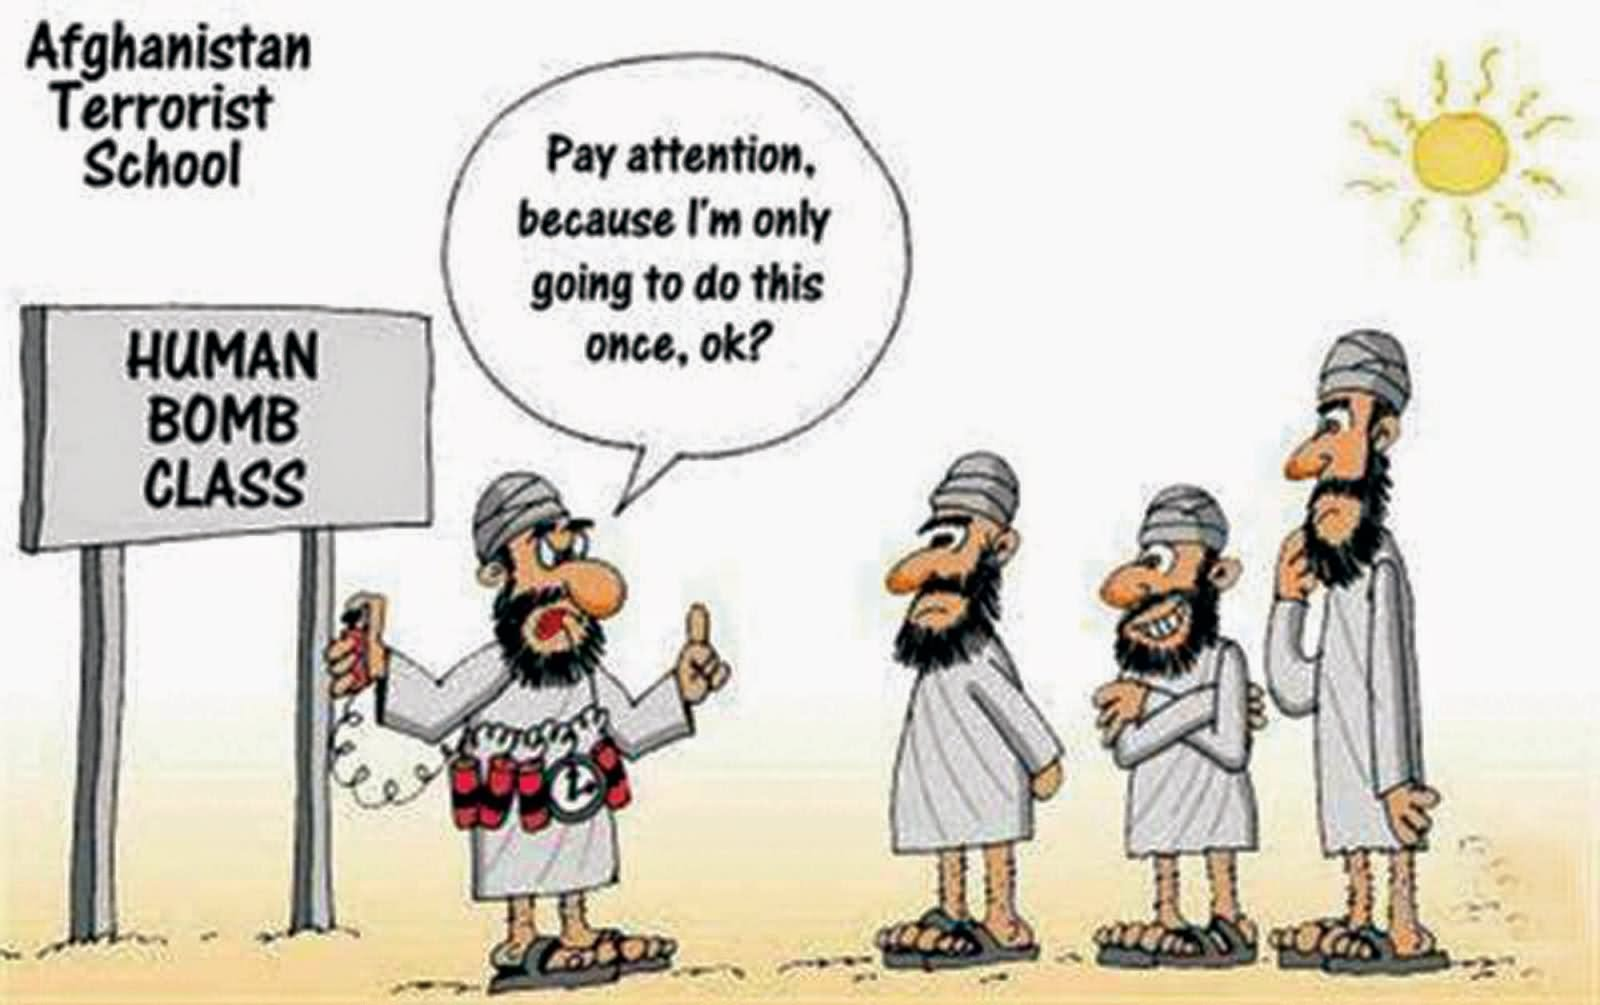 Funny-Afghanistan-Terrorist-School-Cartoons-Image